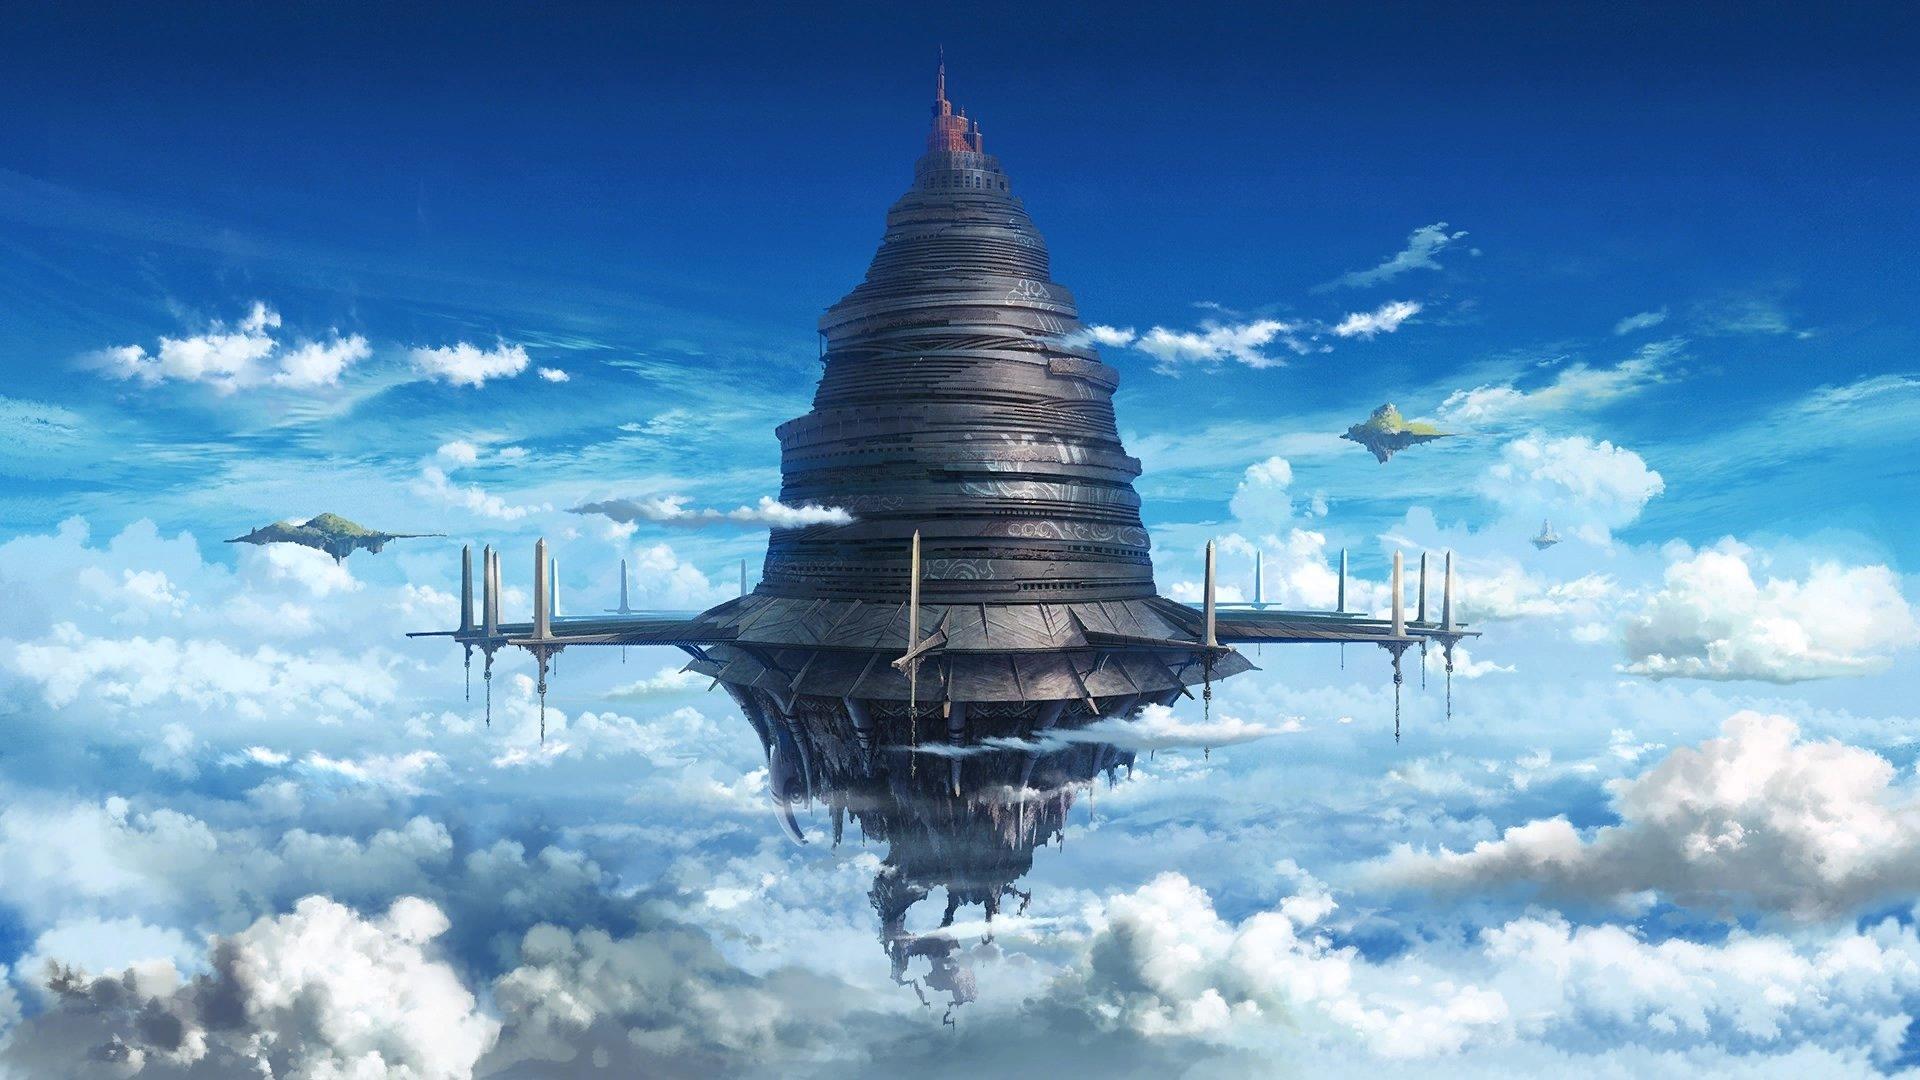 13 Aincrad Sword Art Online 高清壁纸 桌面背景 Wallpaper Abyss